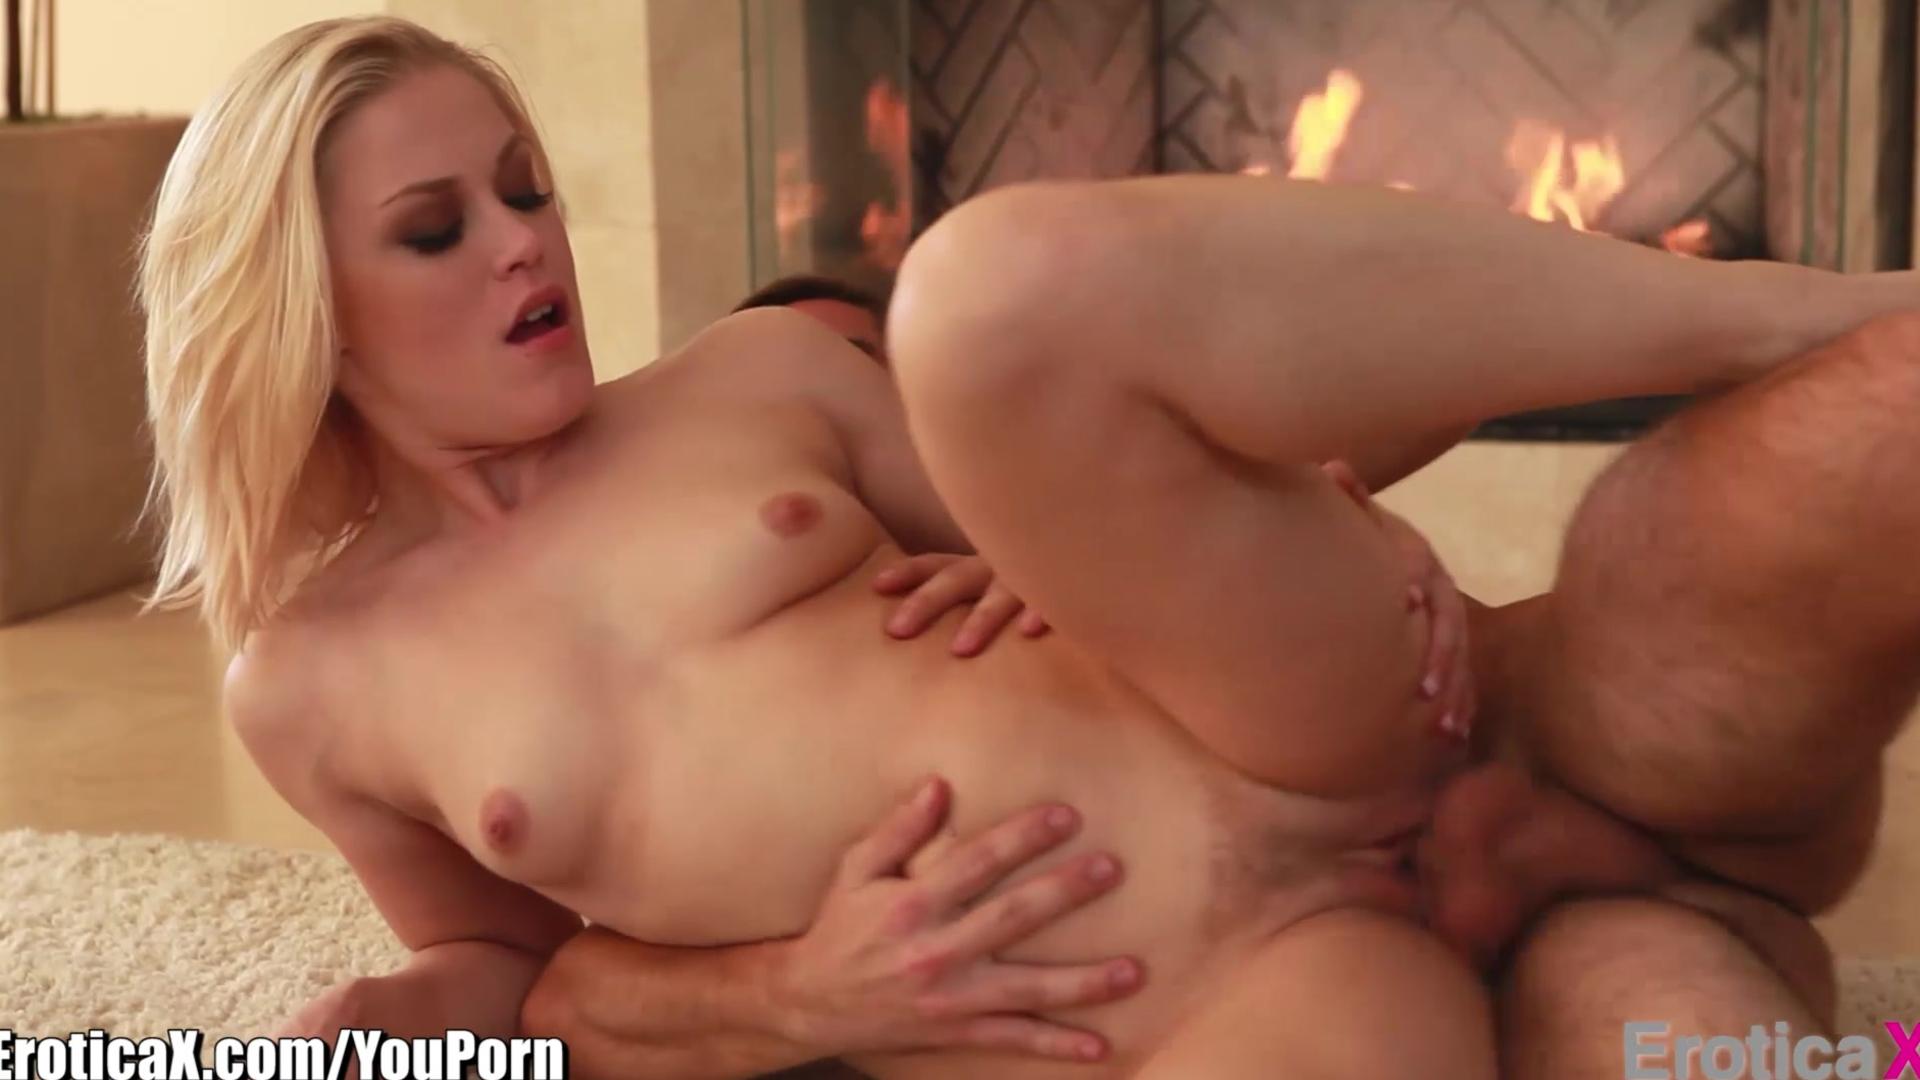 EroticaX COUPLE s PORN: Winter RendezVous